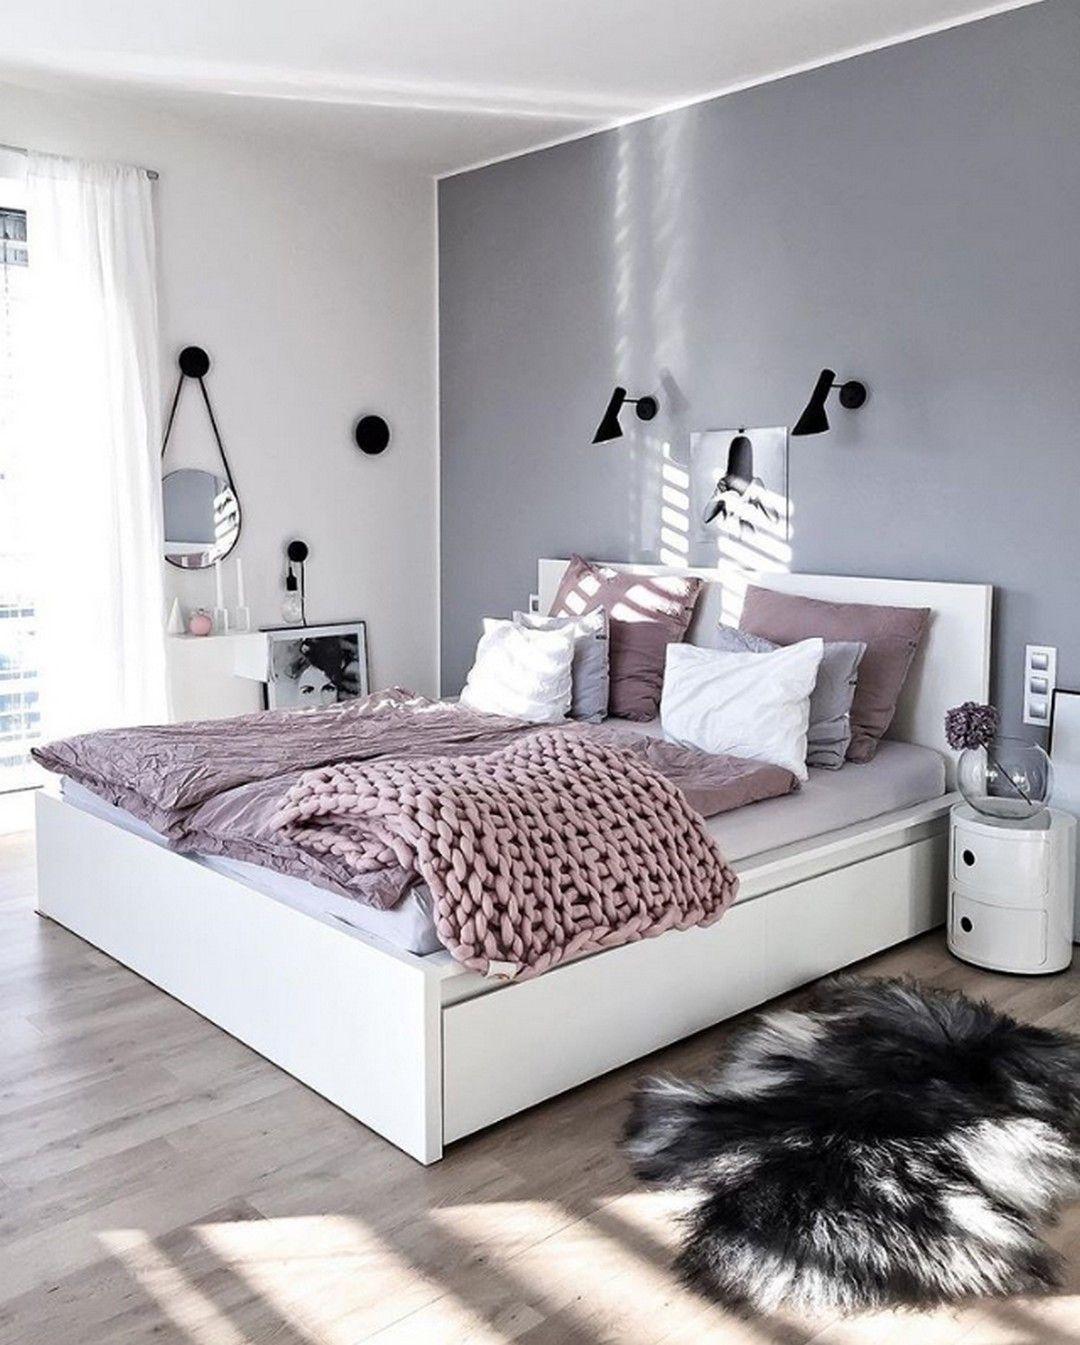 99 White And Grey Master Bedroom Interior Design Gray Master